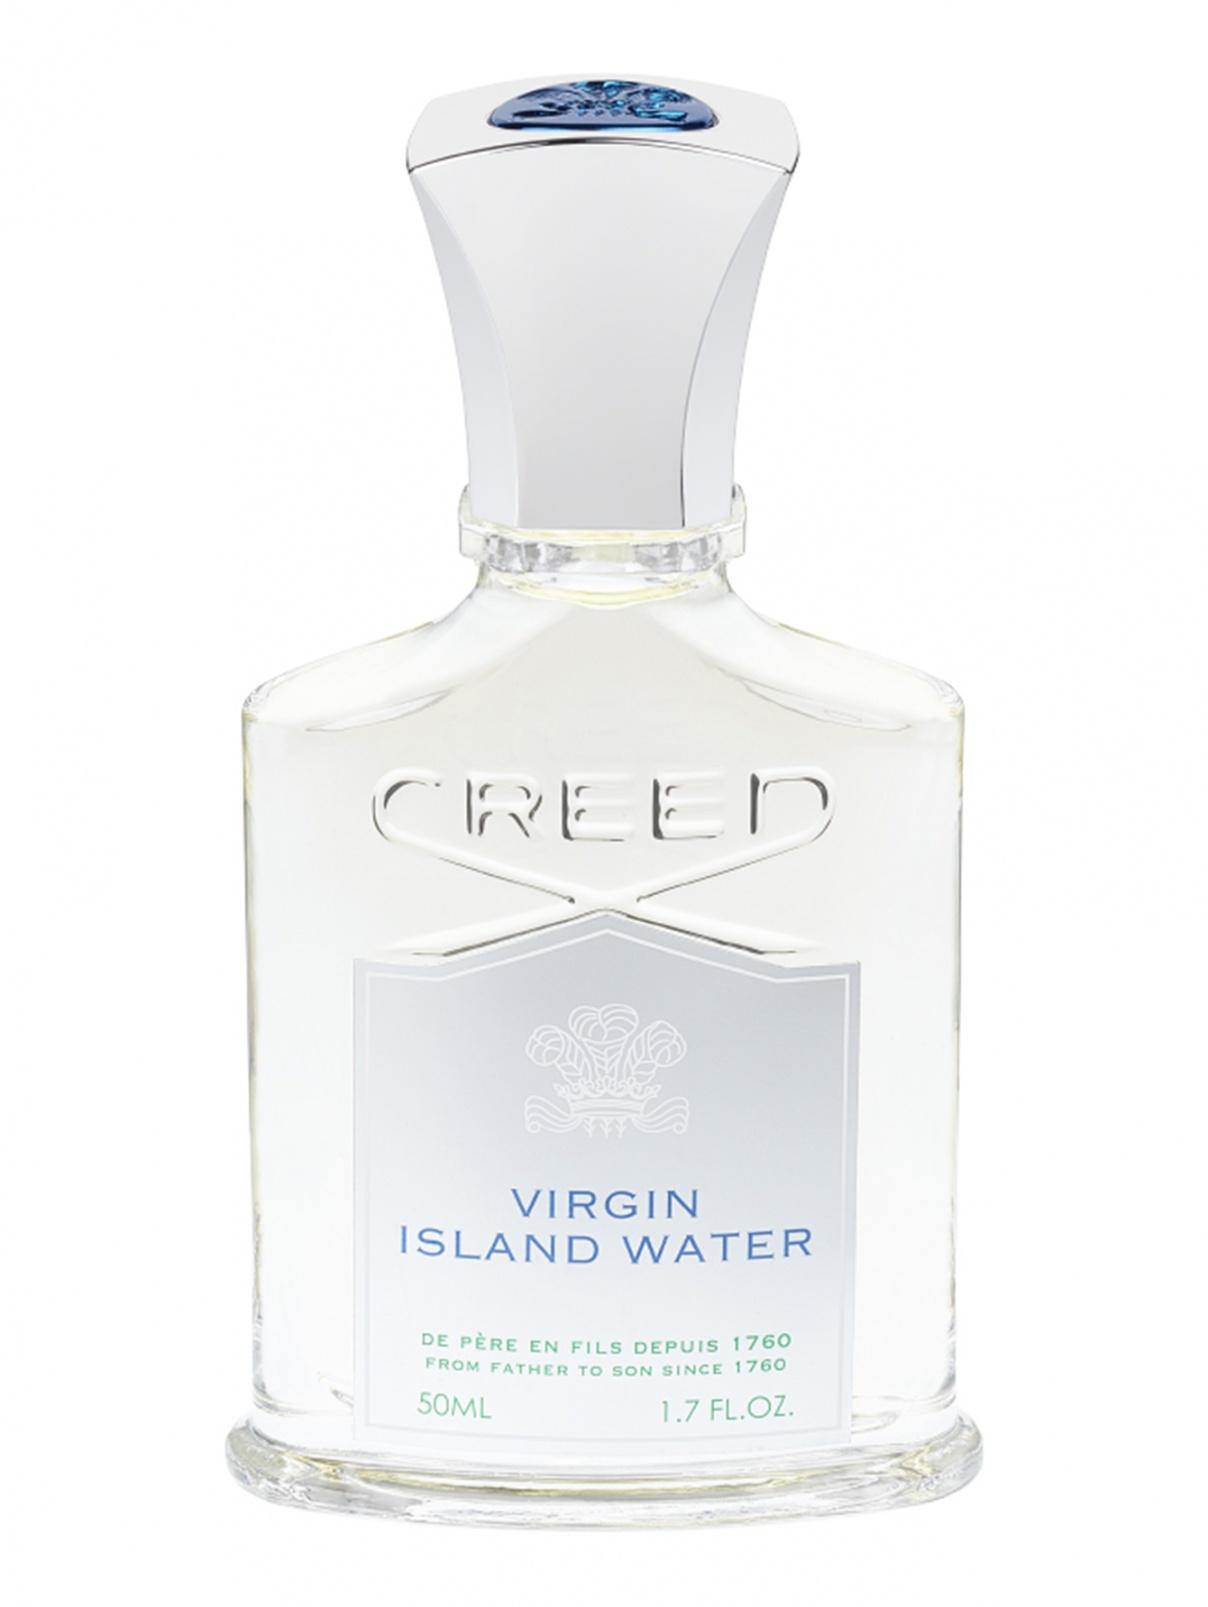 Парфюмерная вода 50 мл Virgin Island Water Creed  –  Общий вид